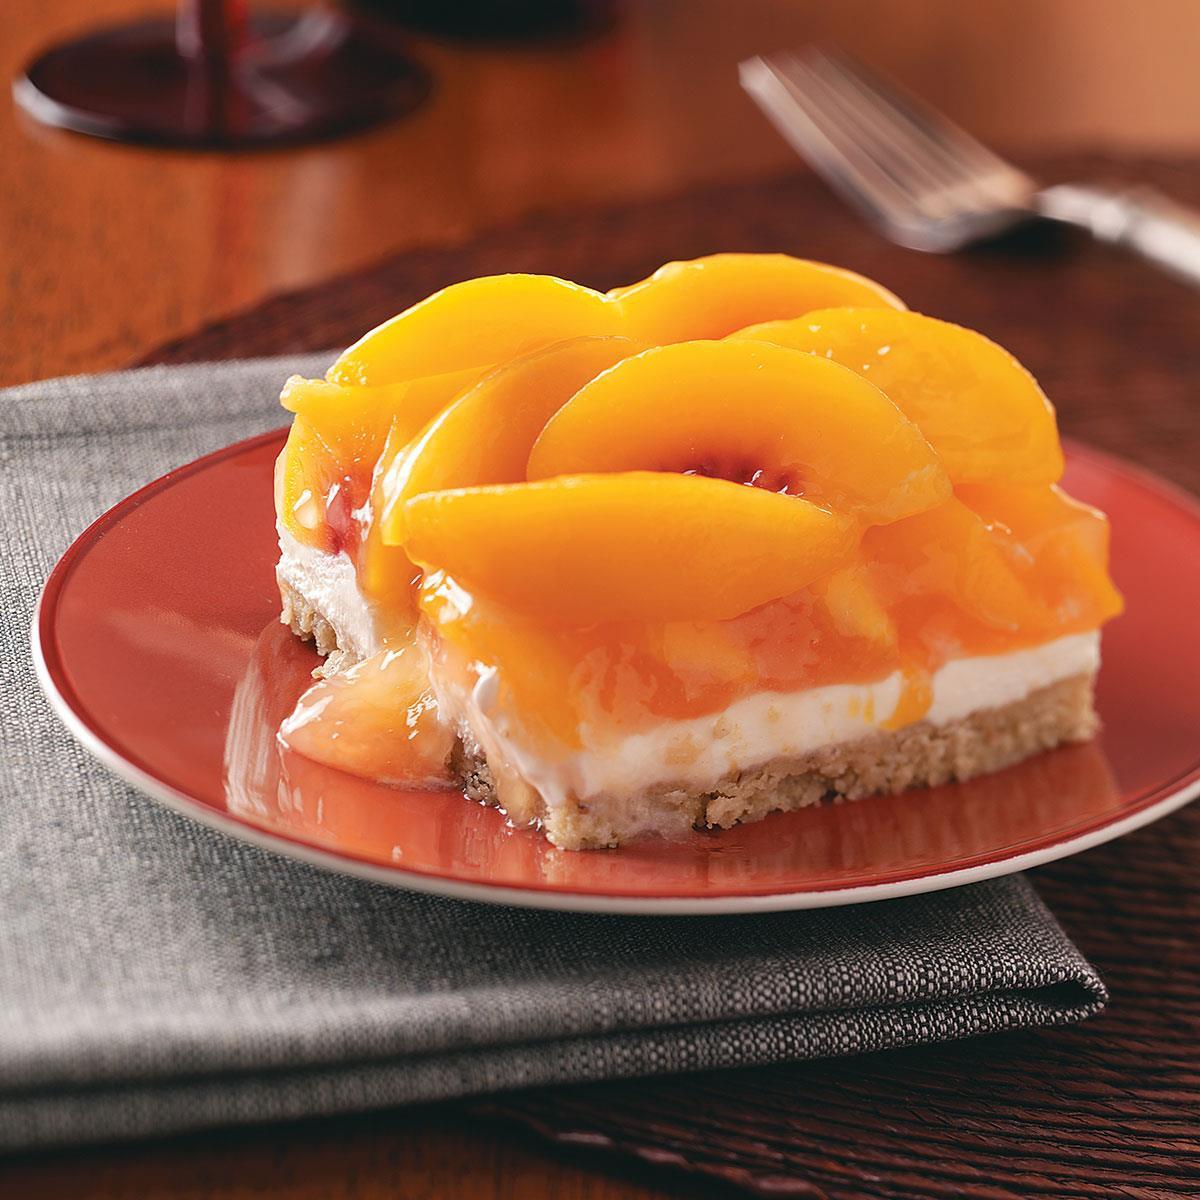 Peach Desserts Recipes  Peaches & Cream Dessert Recipe